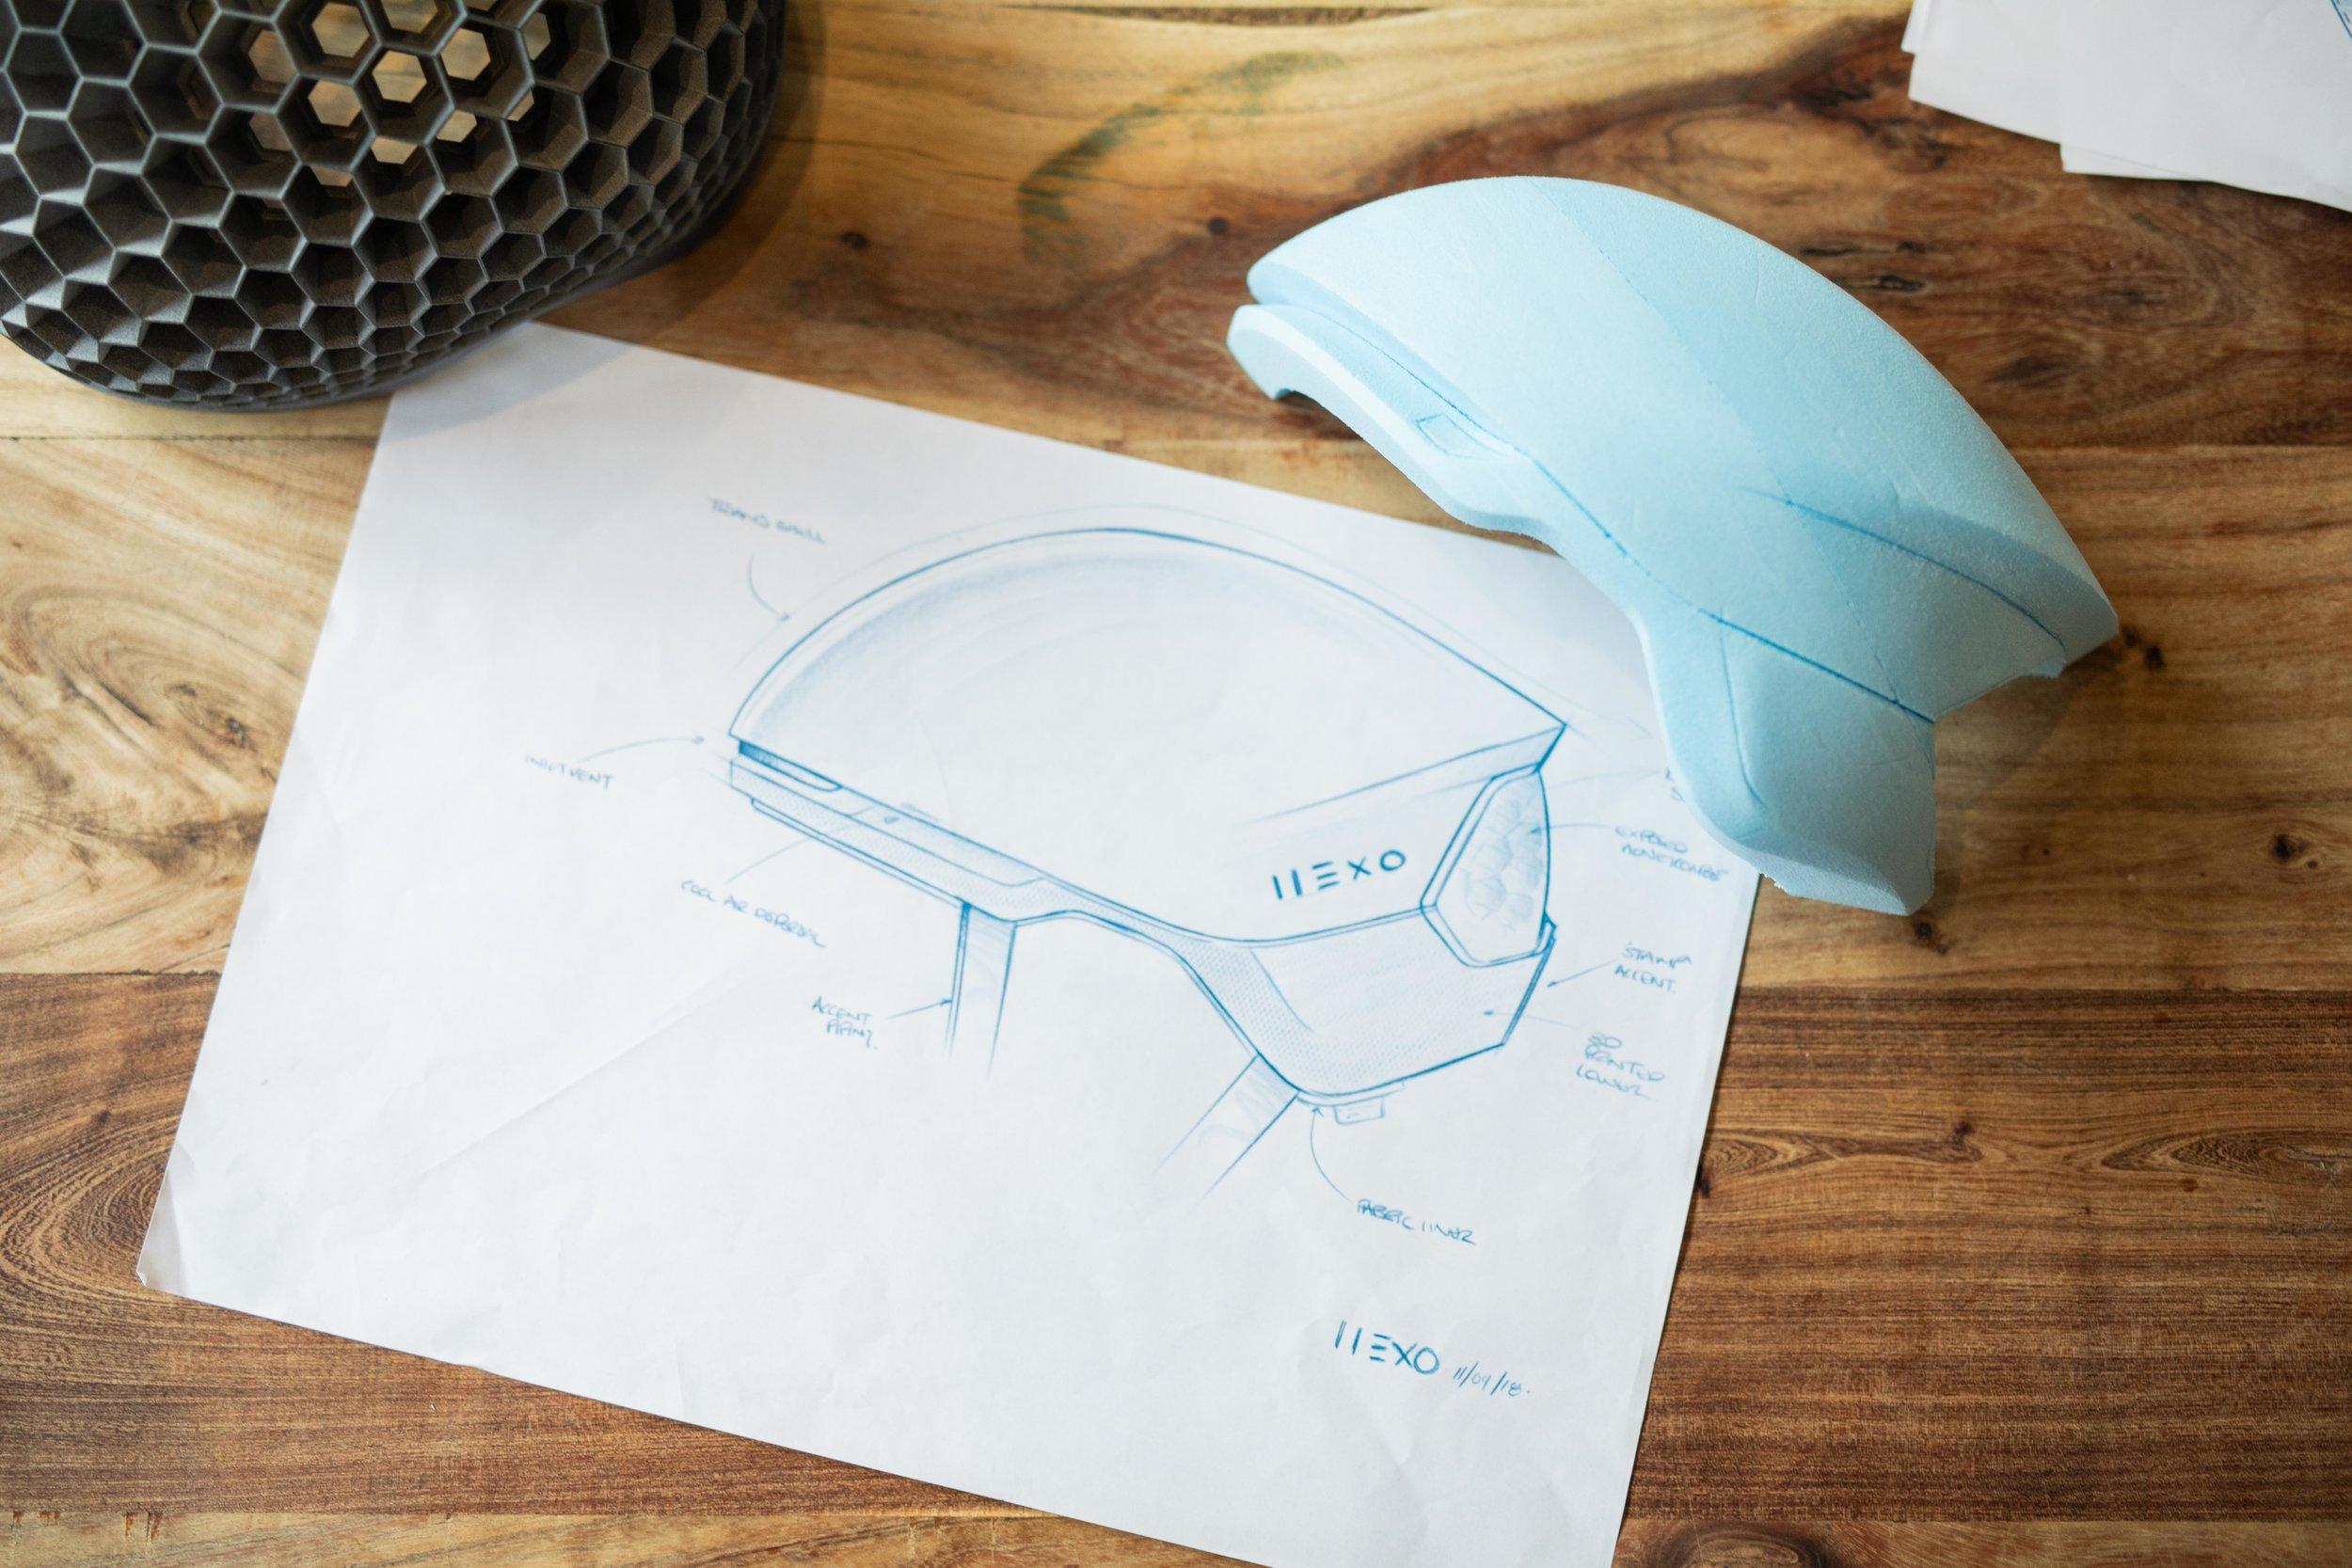 Hexr | Concept development and foam modelling